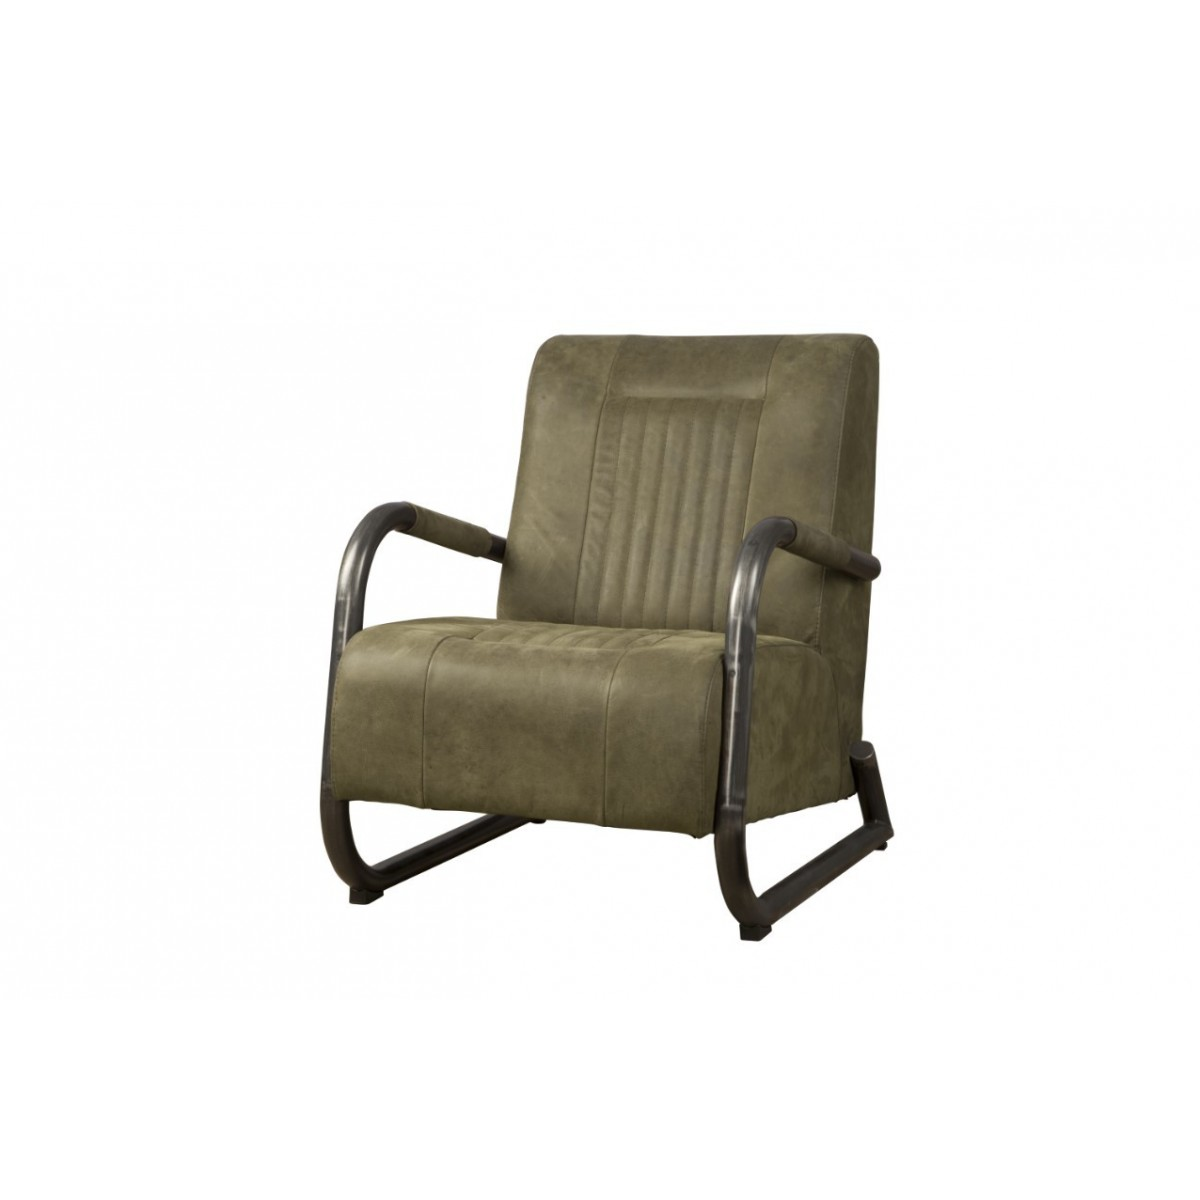 barn-coffeechair-fauteuil-vintage-leer-olive-lm0015